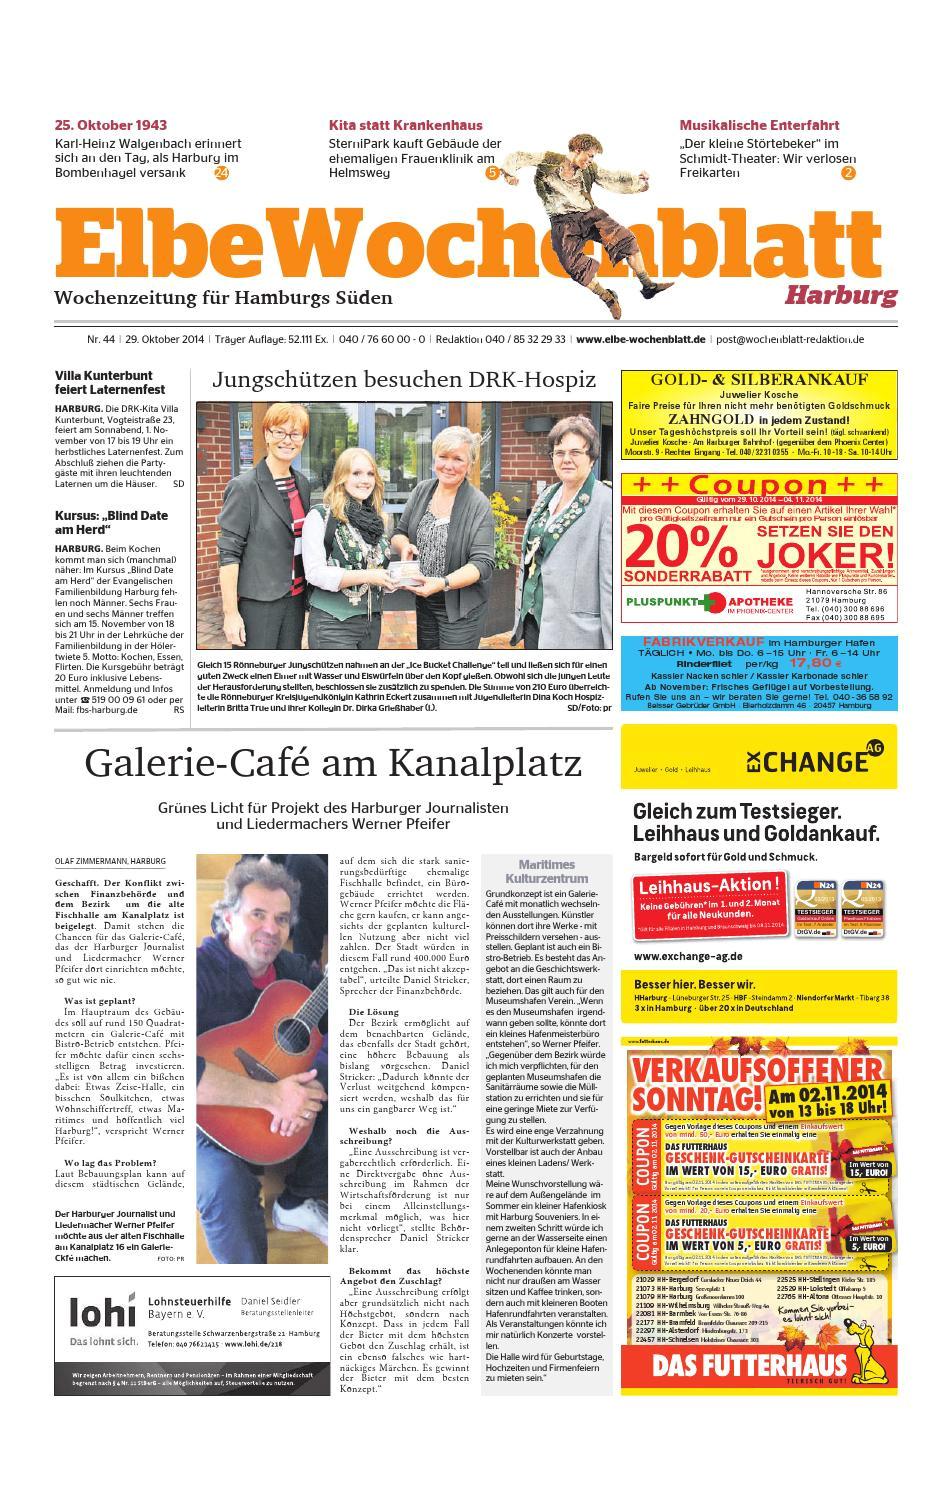 Honolulu Cookie Company Discount Coupon Harburg Kw44 2014 by Elbe Wochenblatt Verlagsgesellschaft Mbh Co